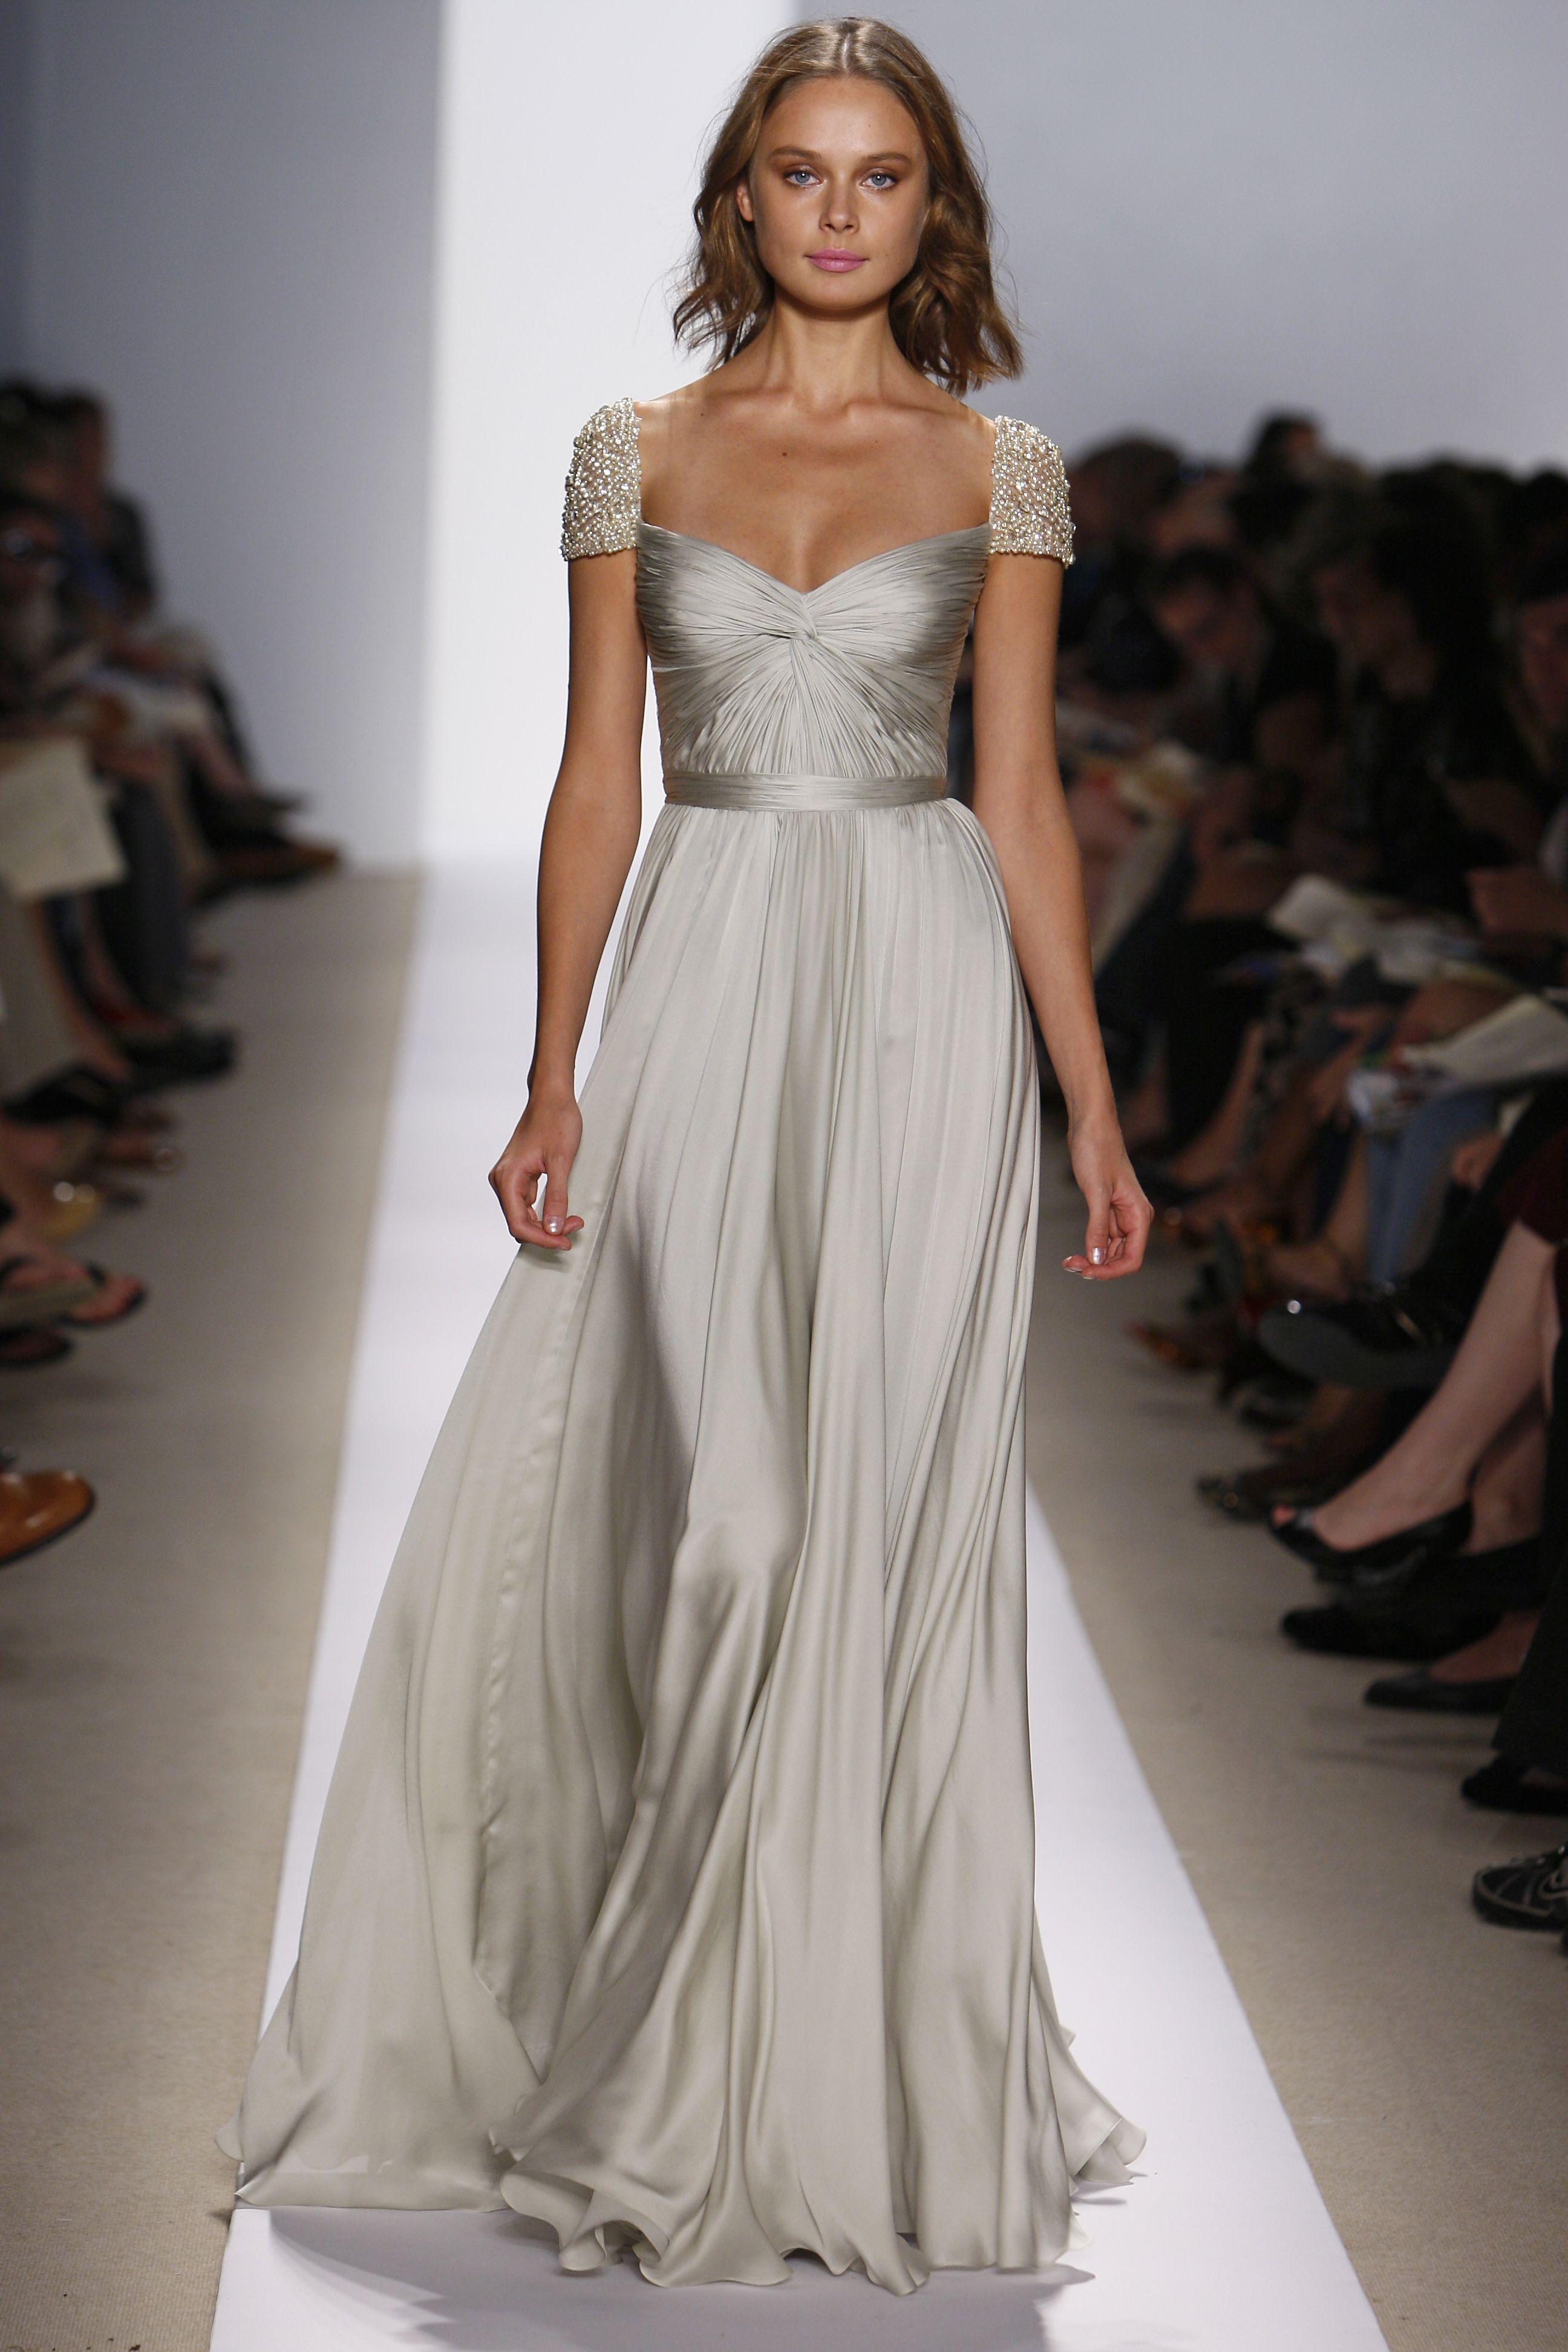 Olivia Wilde in Calvin Klein Collection